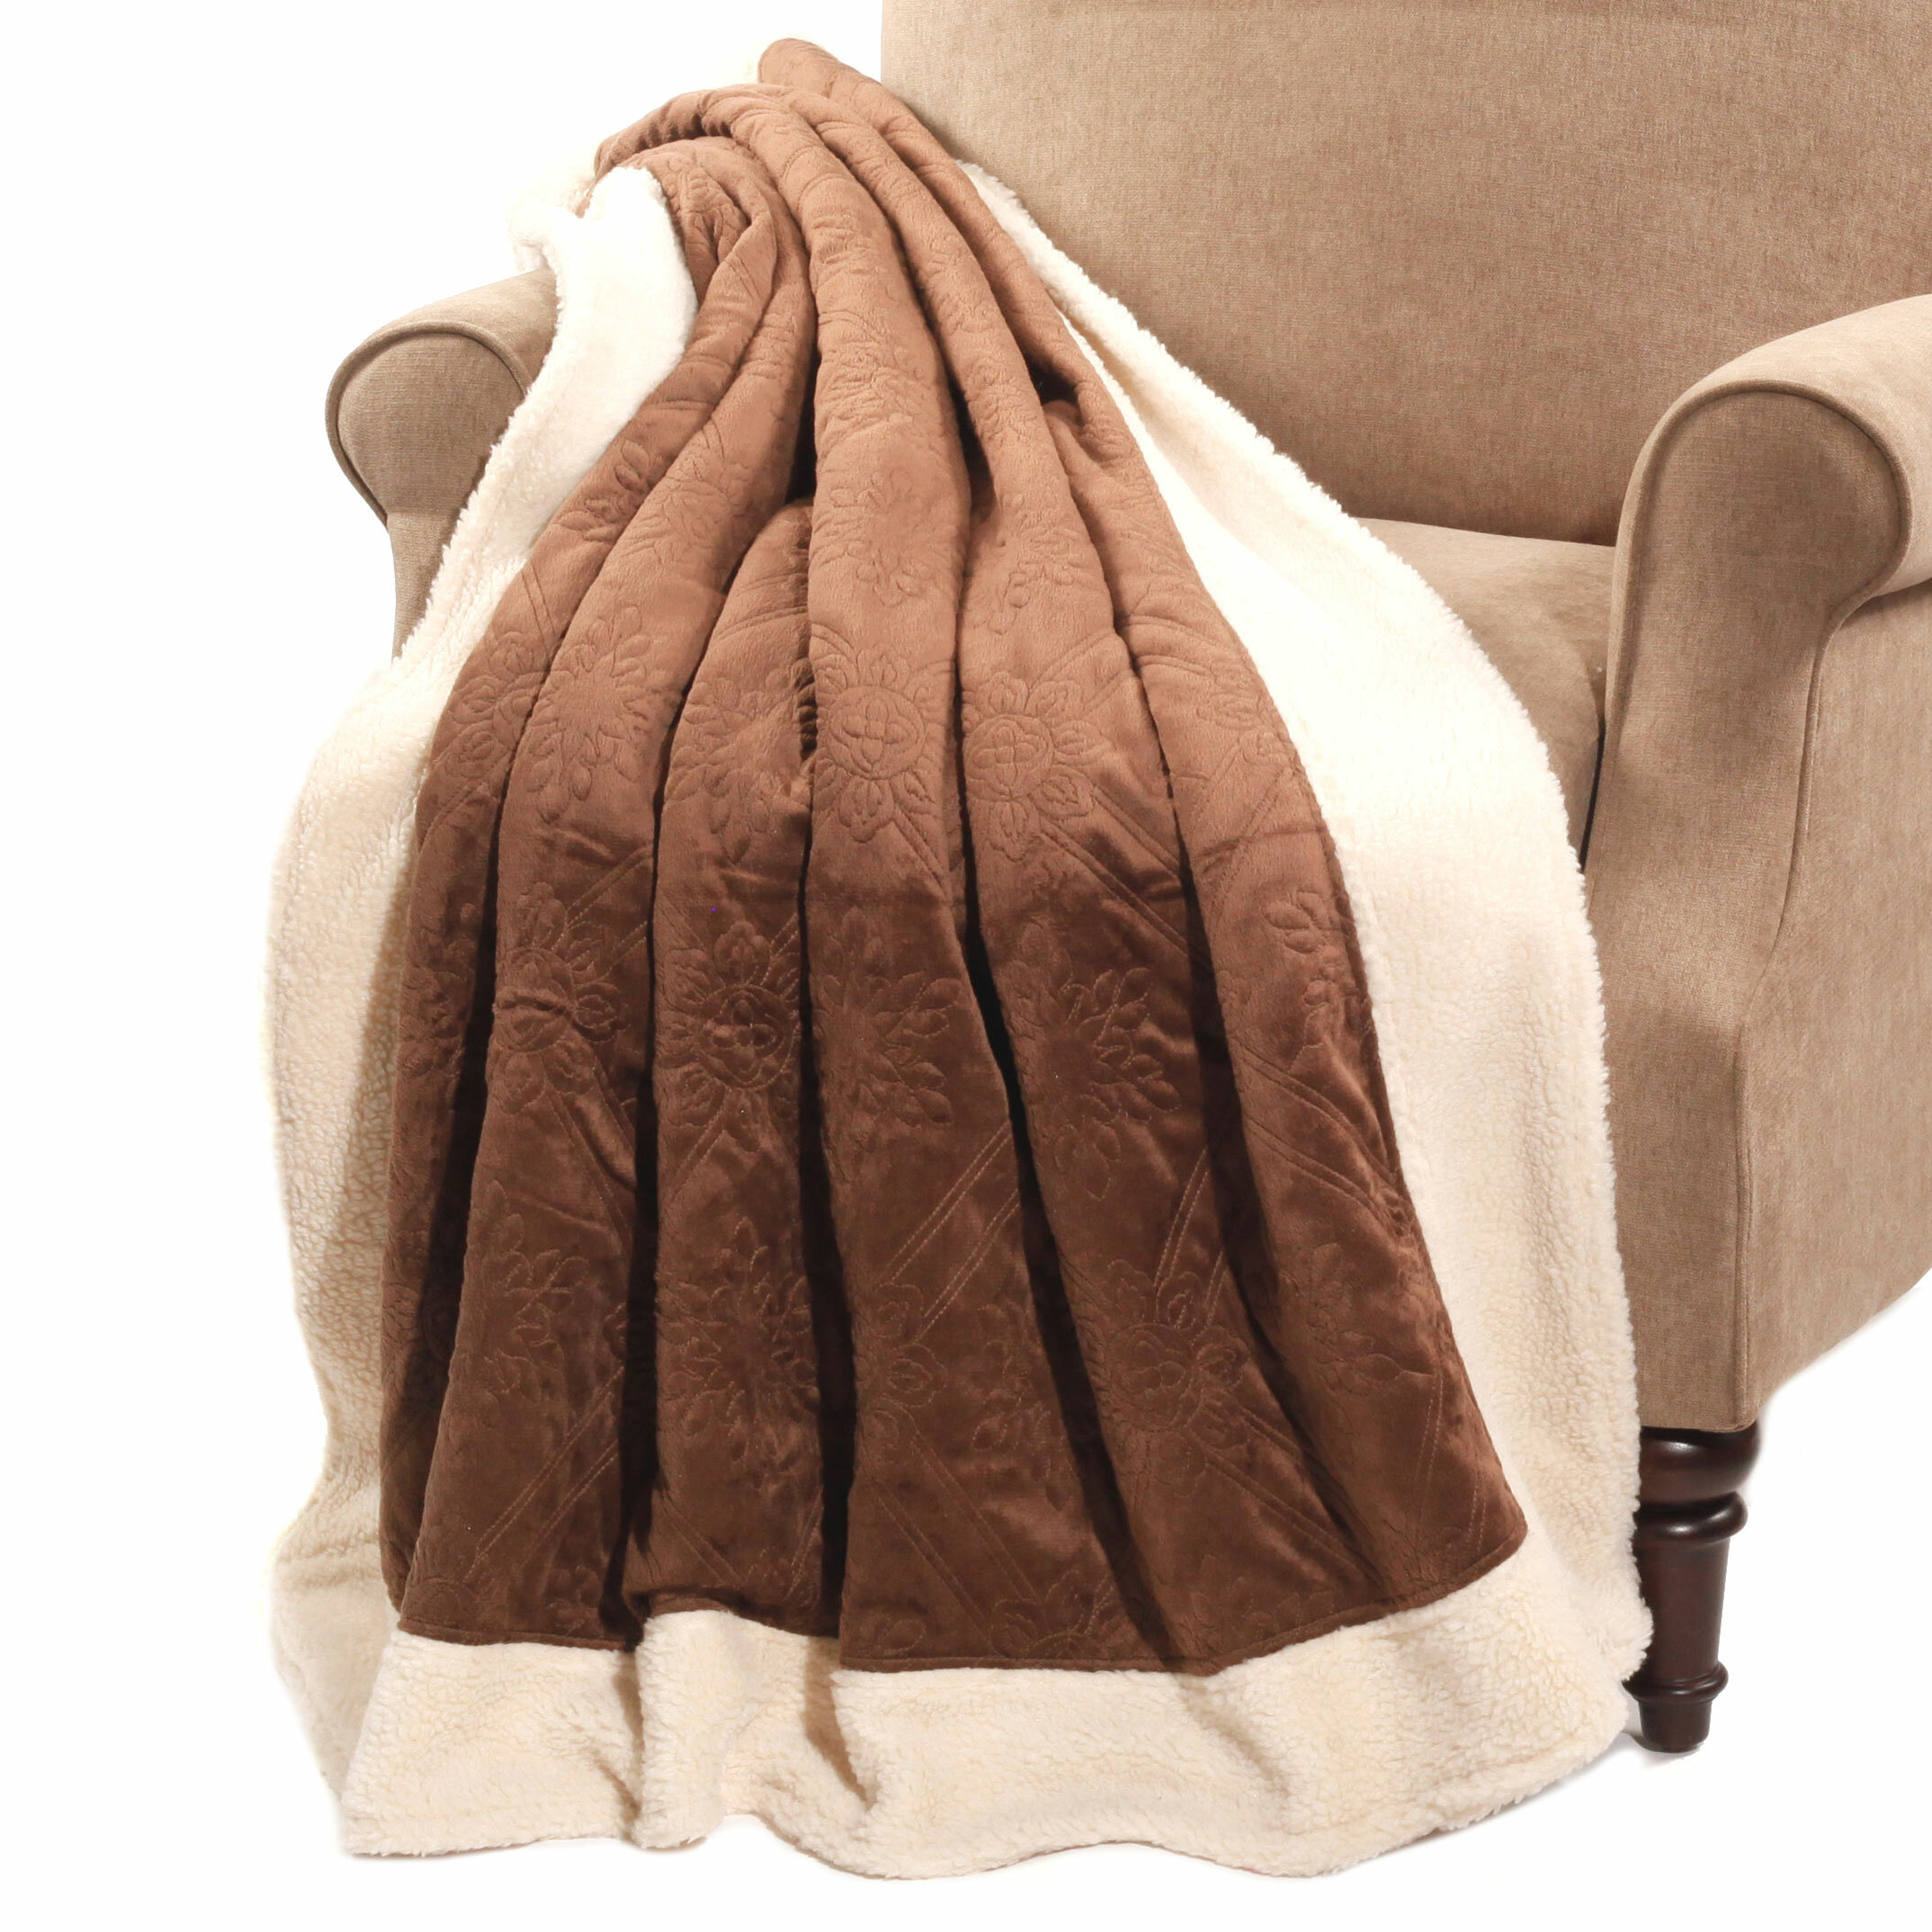 BOON Throw & Blanket Micro Plush Sherpa Throw & Reviews | Wayfair